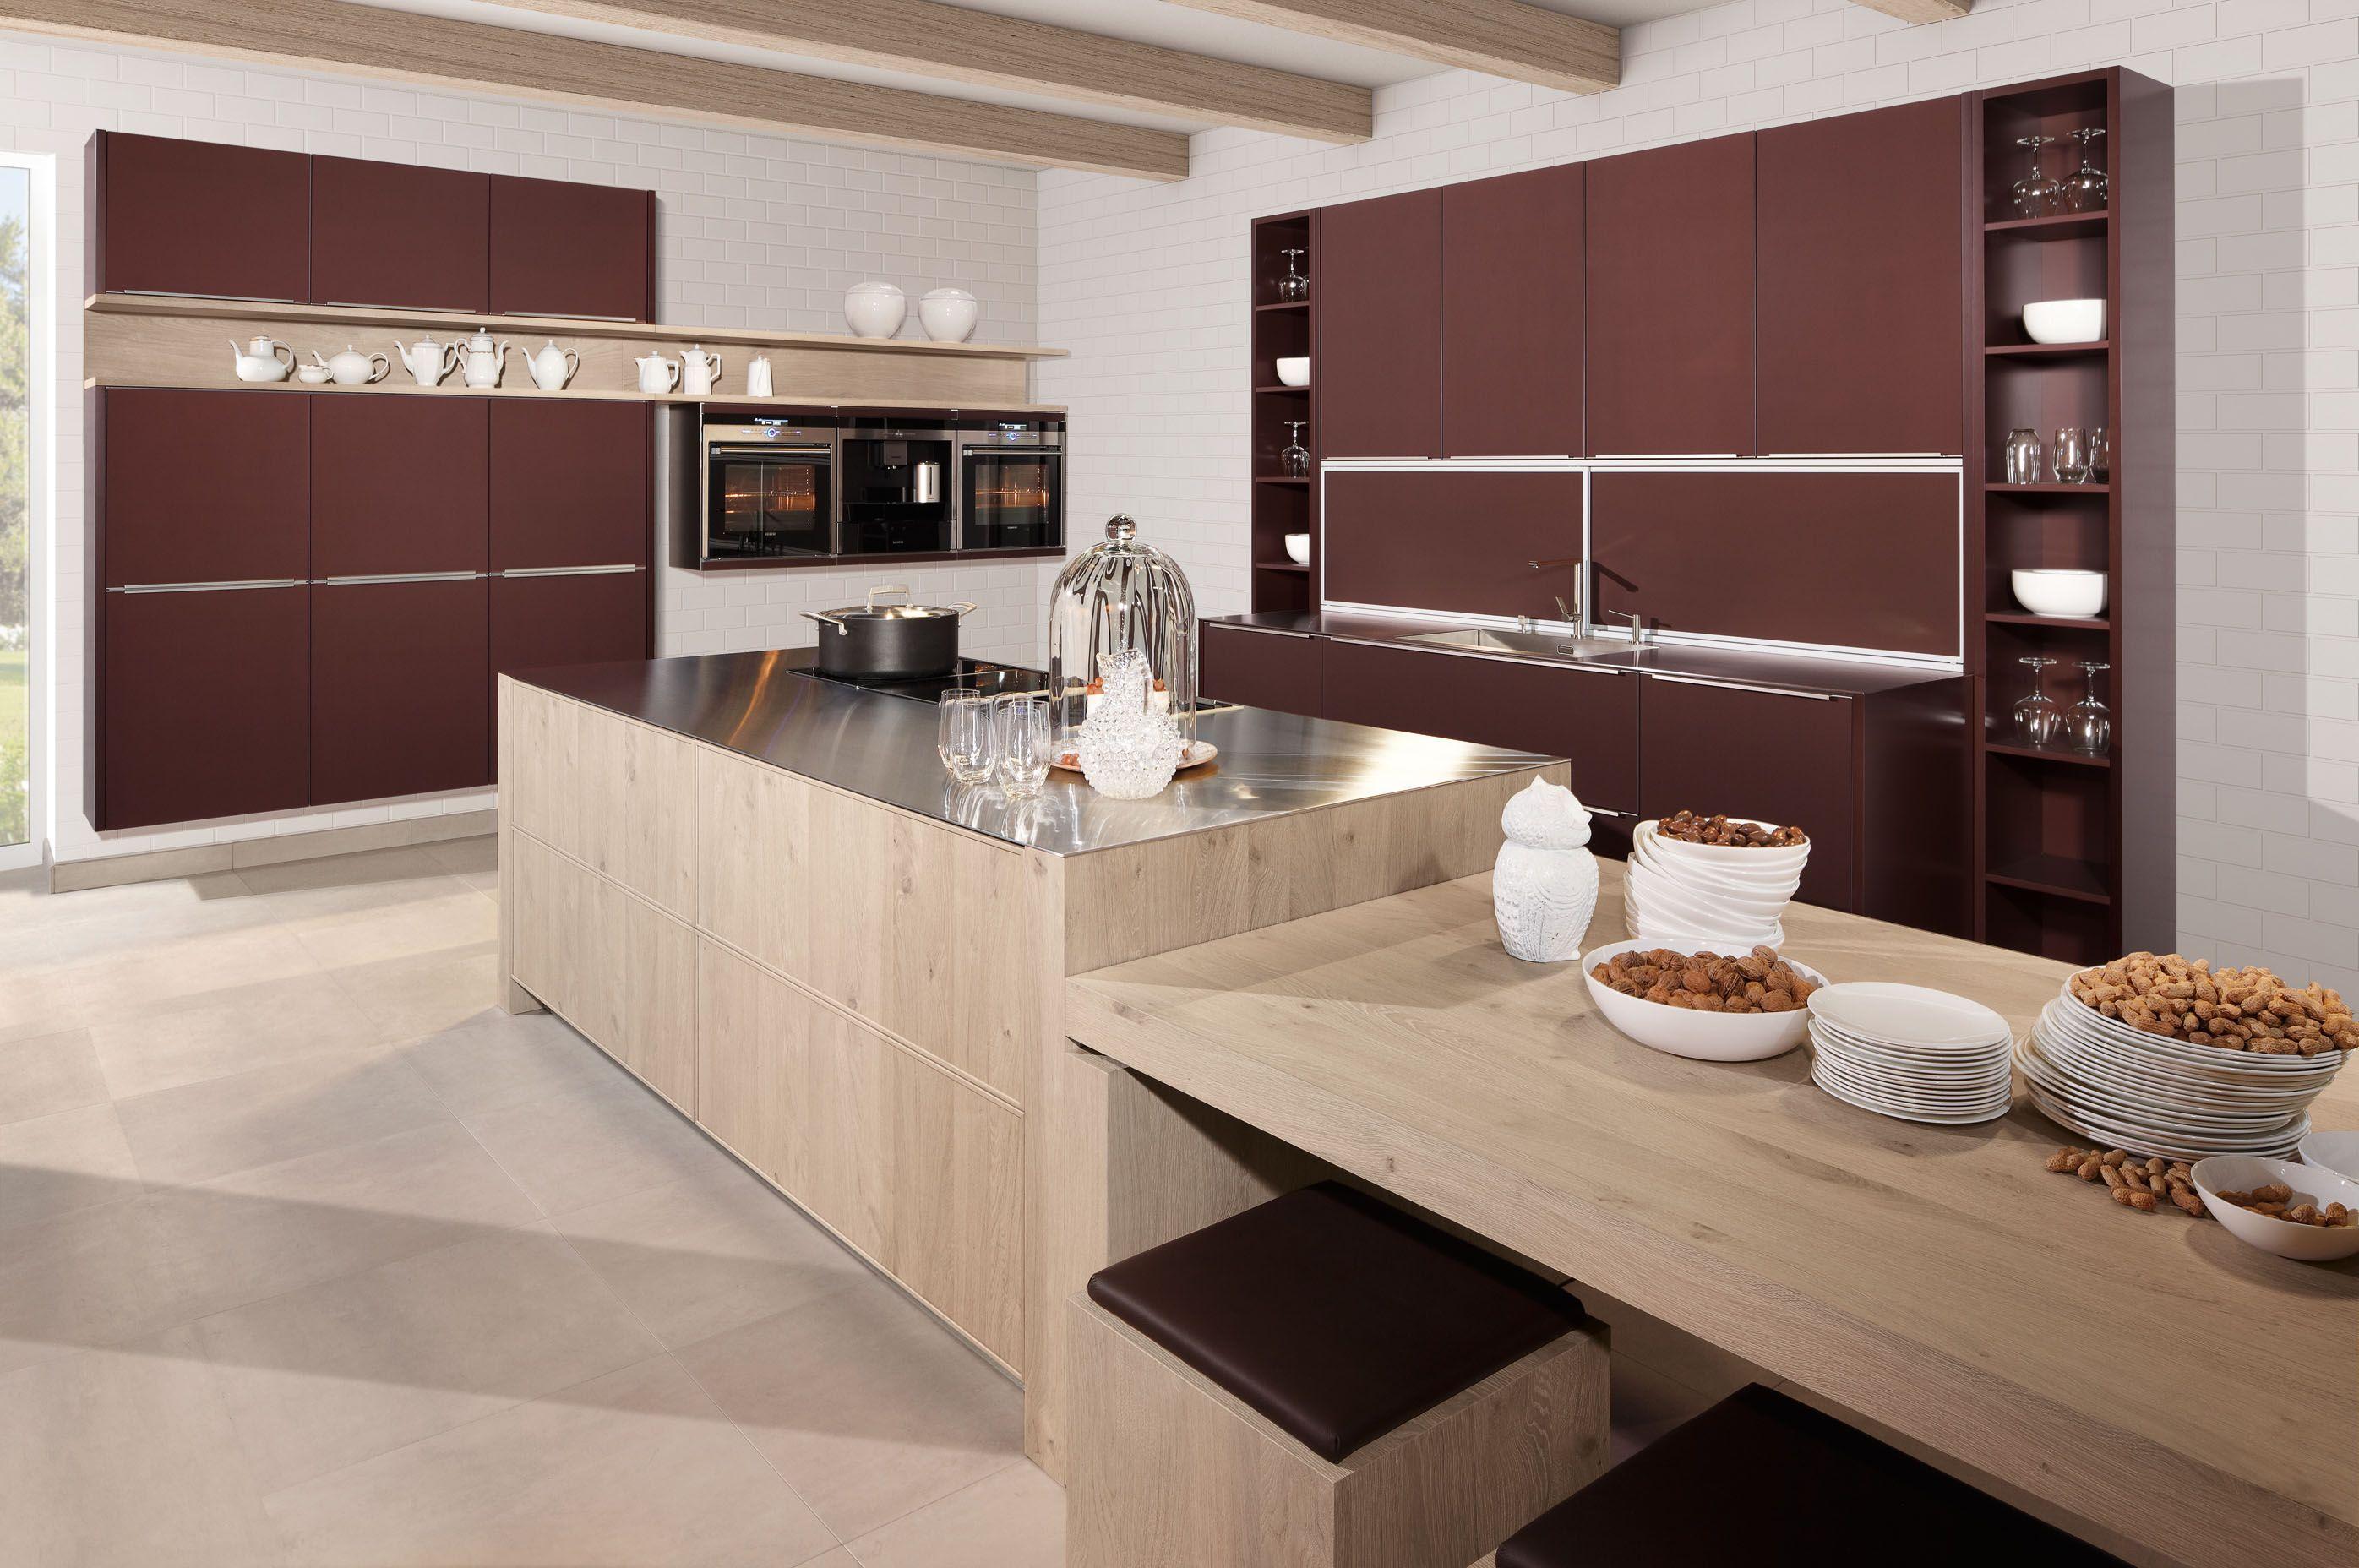 Moderne keukens met eiland en tafel: keuken tieleman exclusief ...